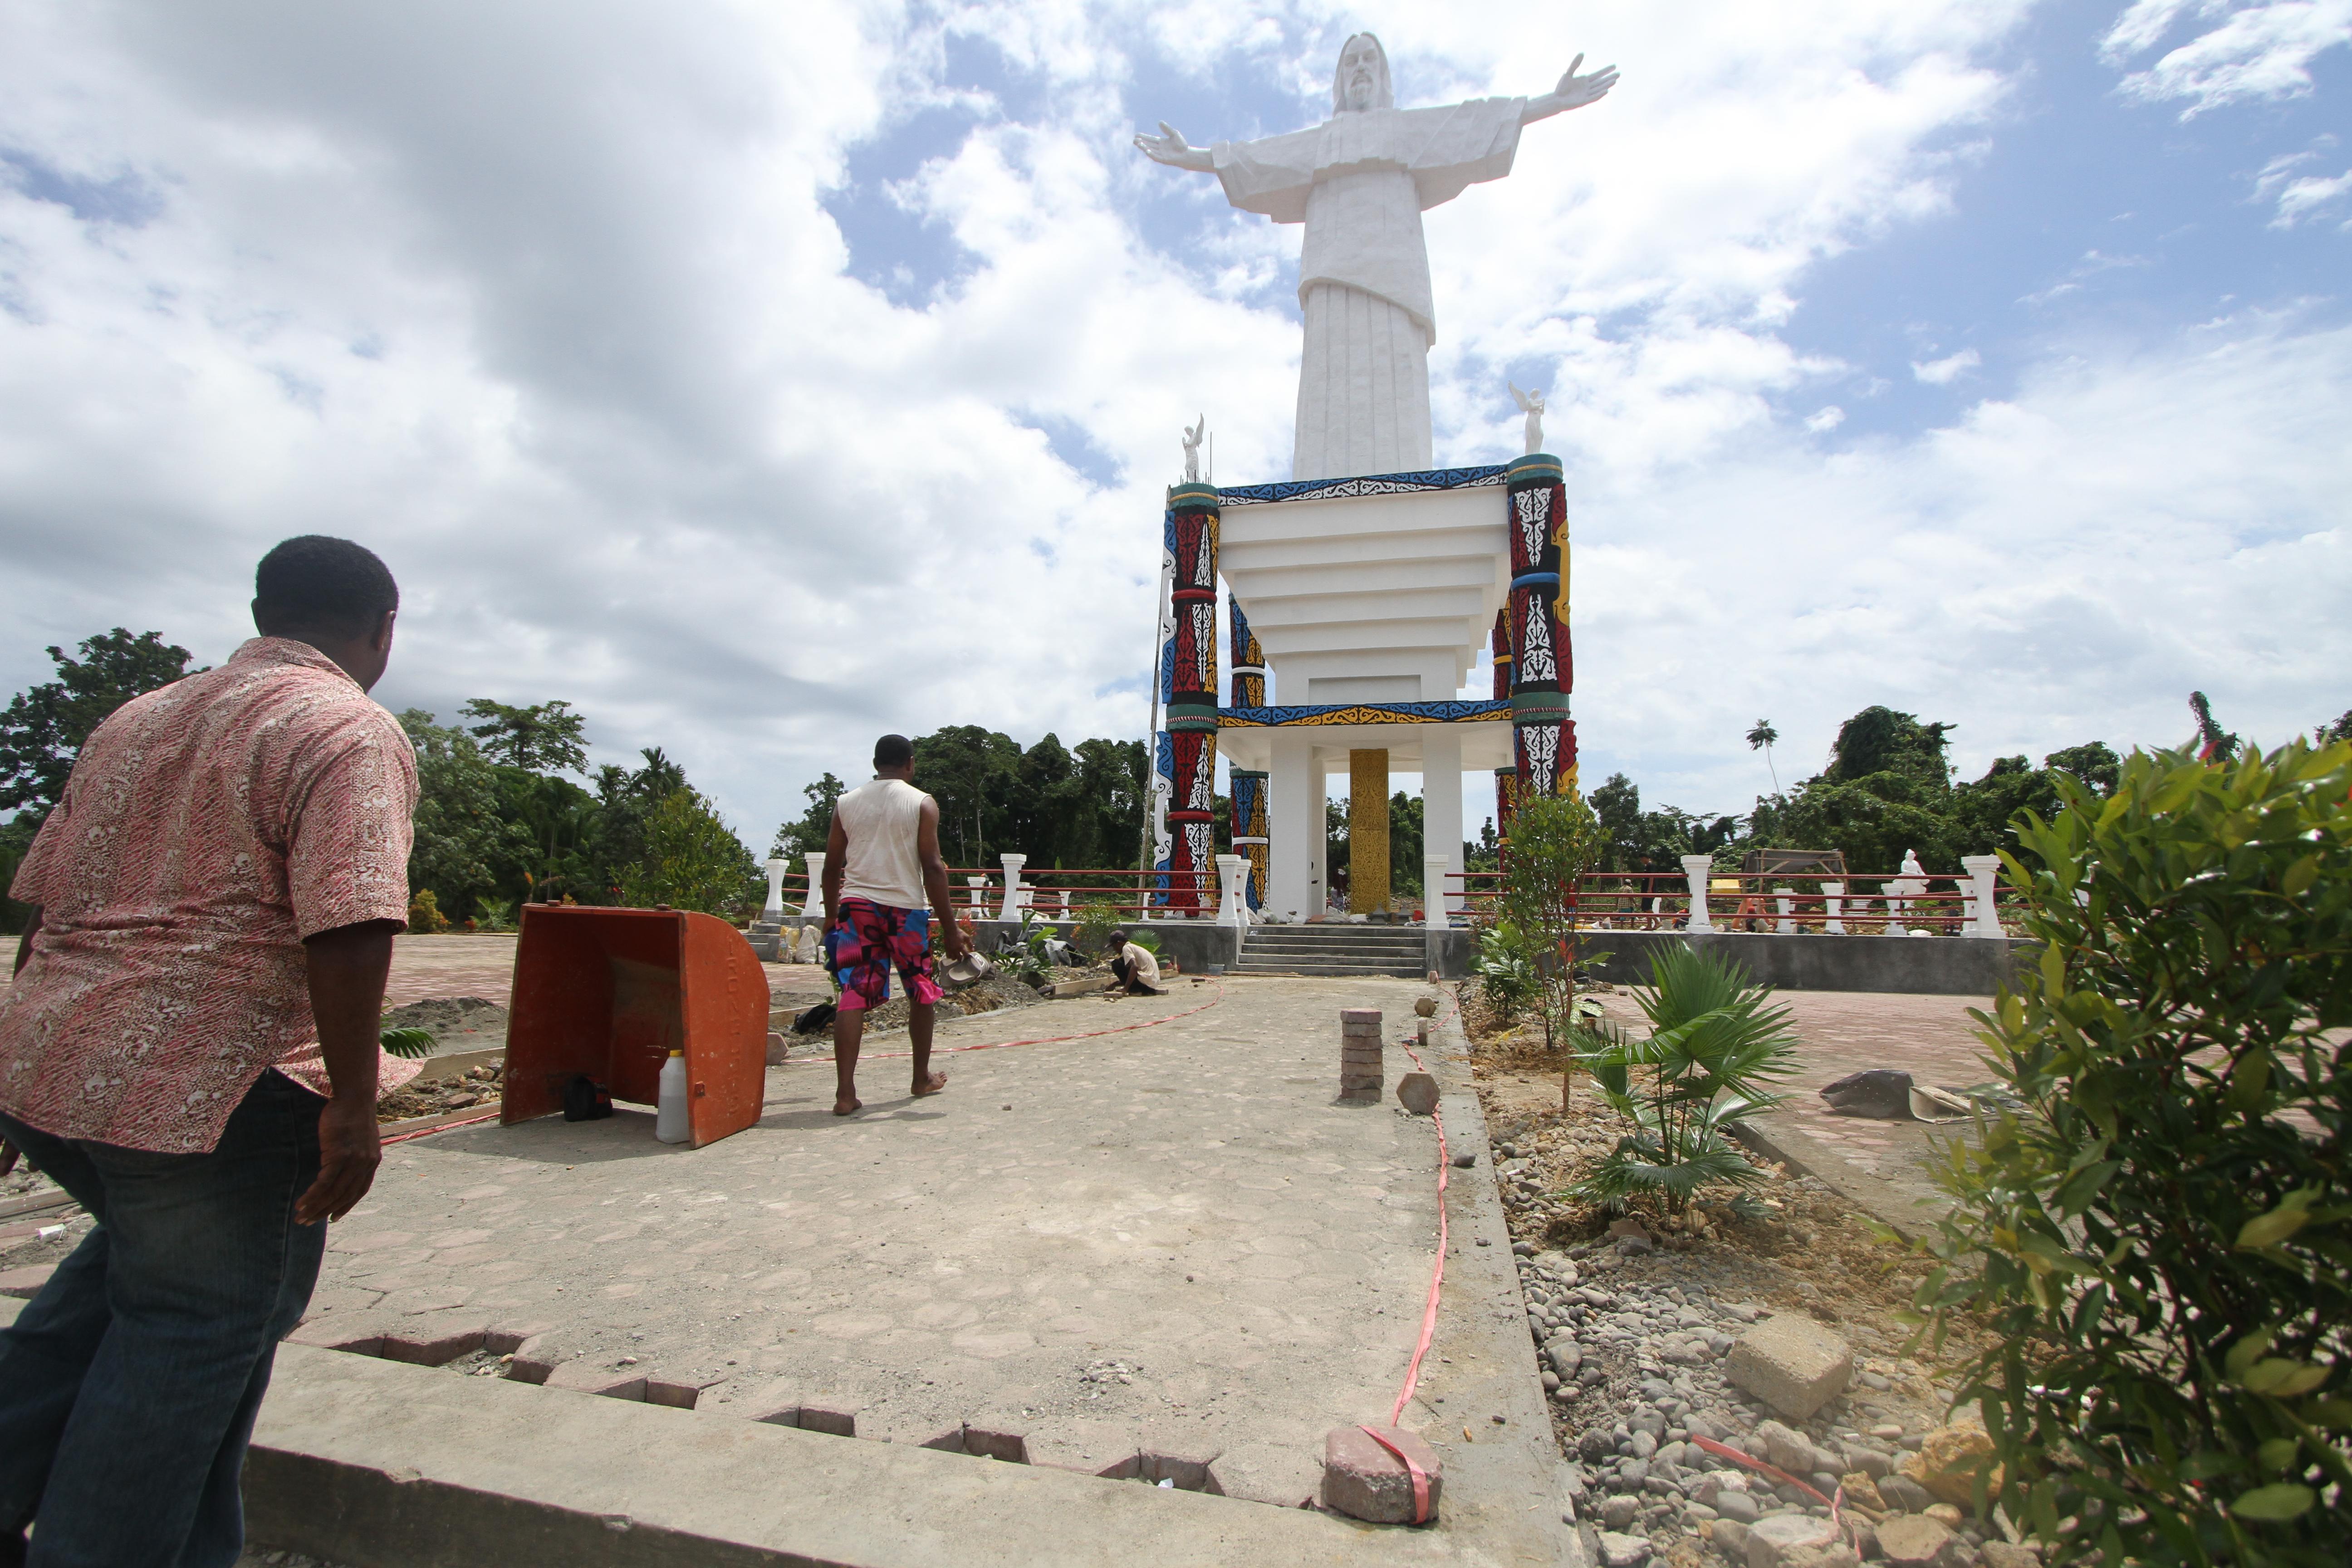 Patung Yesus Bukti Peradaban Papua Suara Pembaruan Warga Mengamati Puncak